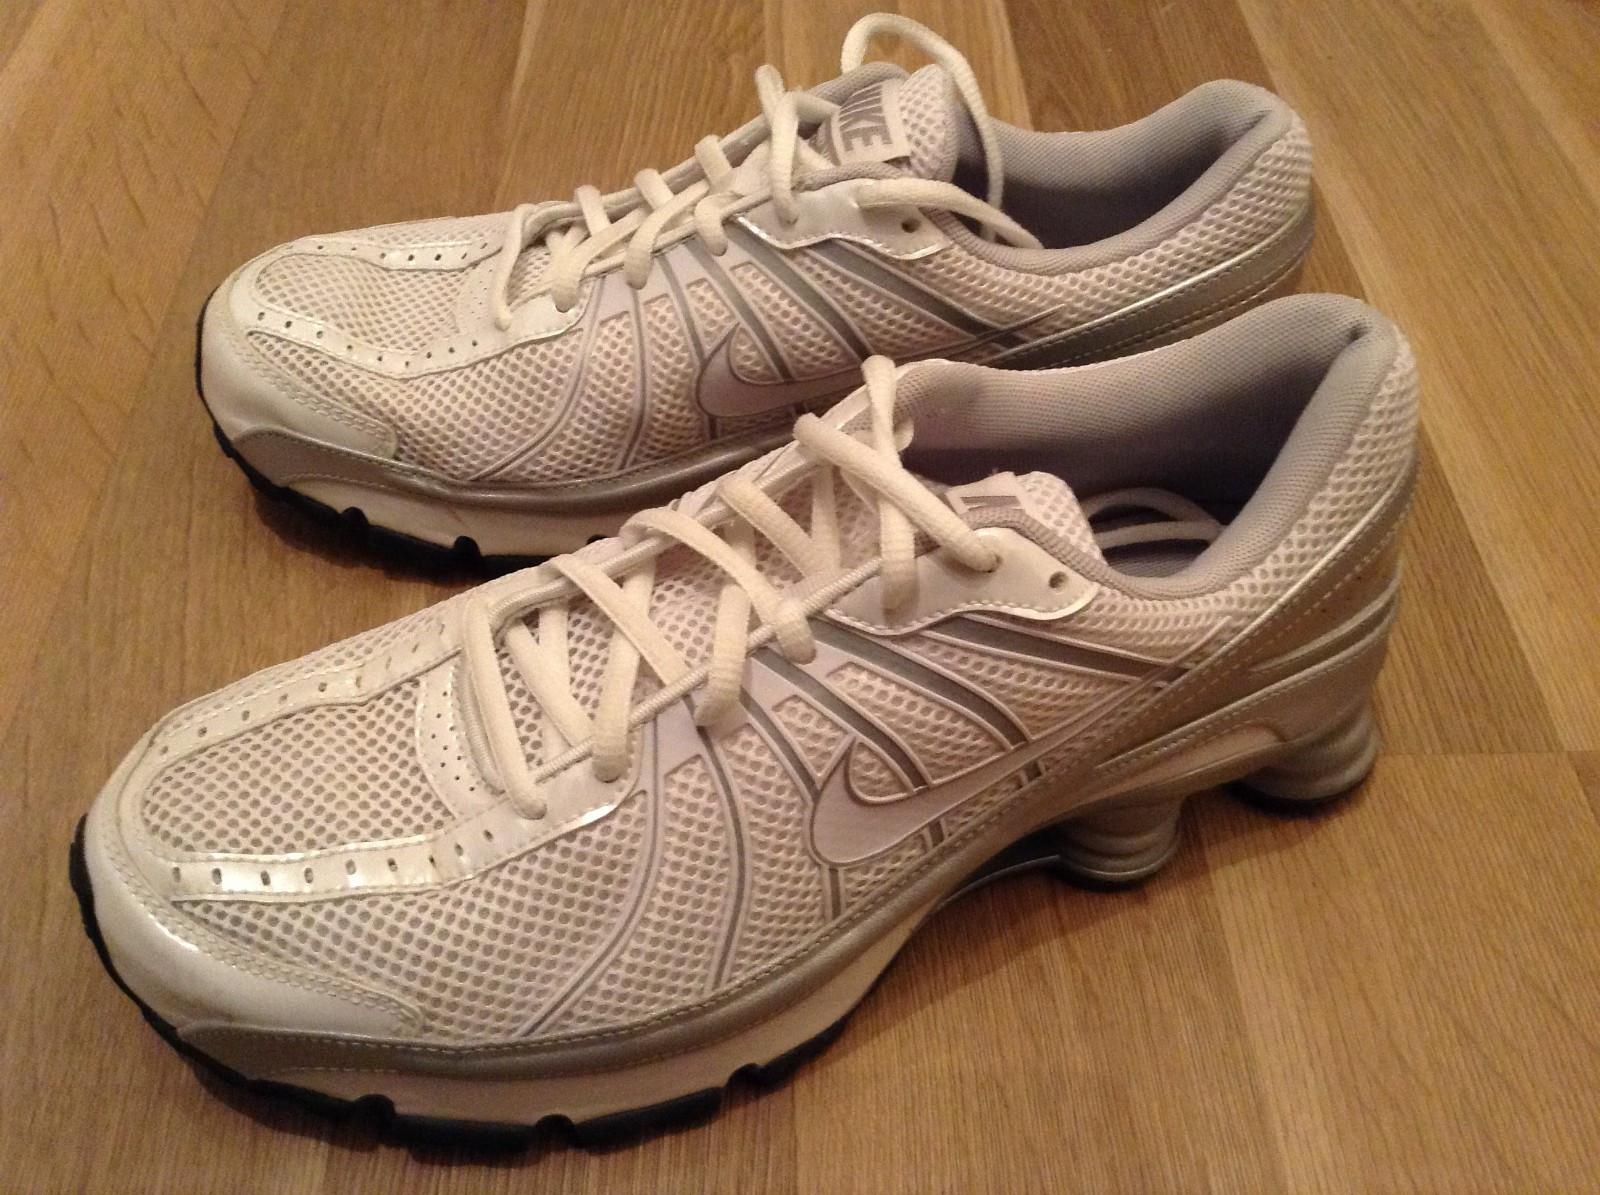 FINN – Nike Shox sko str 42,5